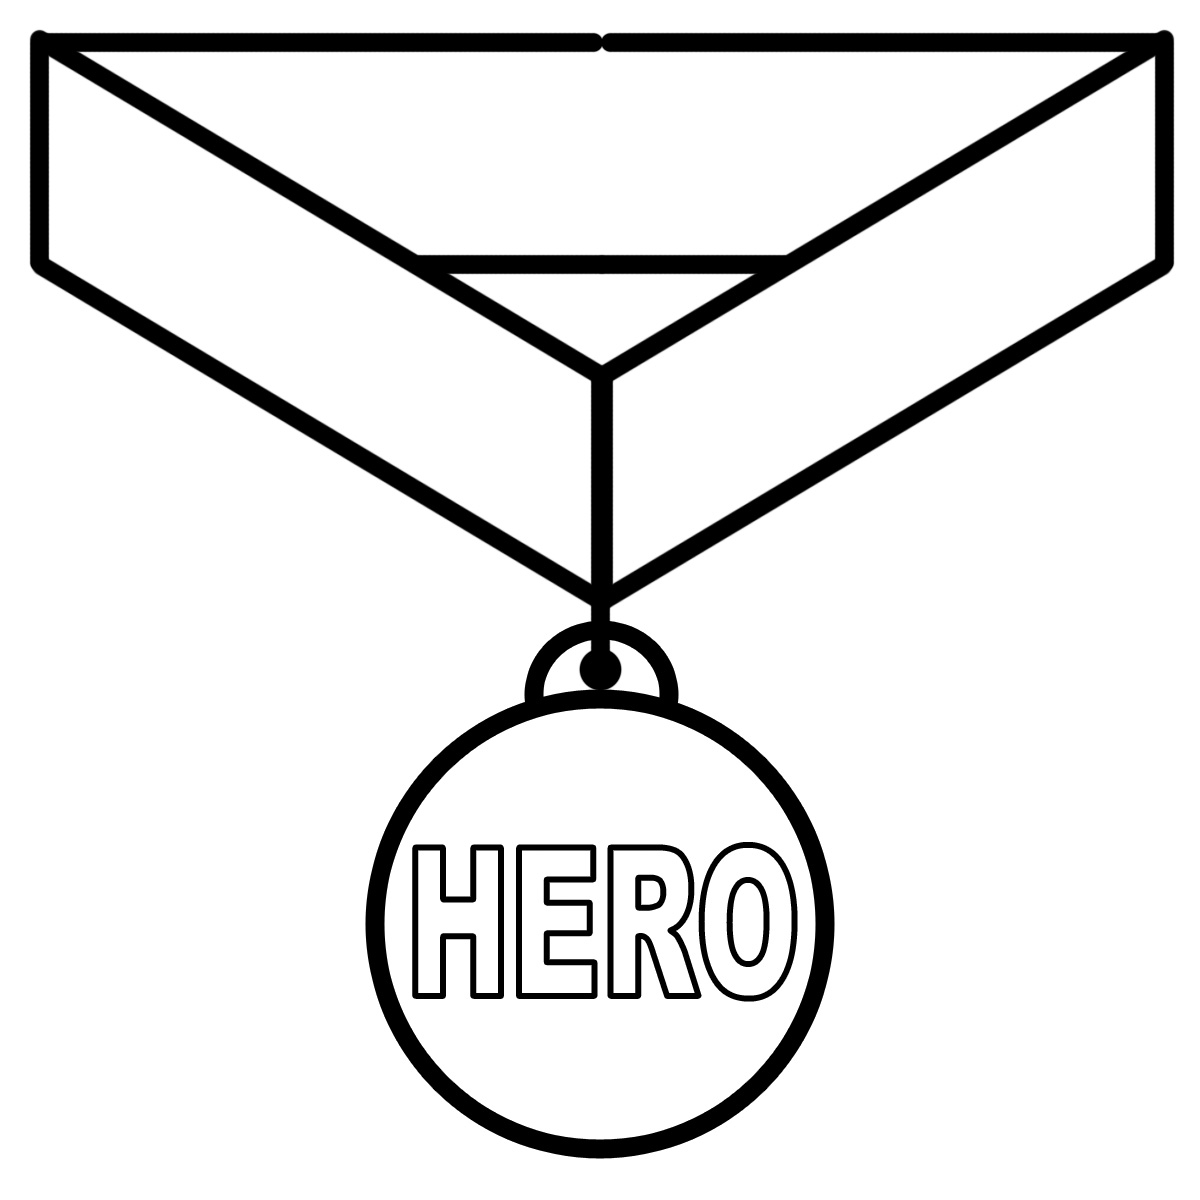 Free Metal Award Cliparts, Download Free Clip Art, Free